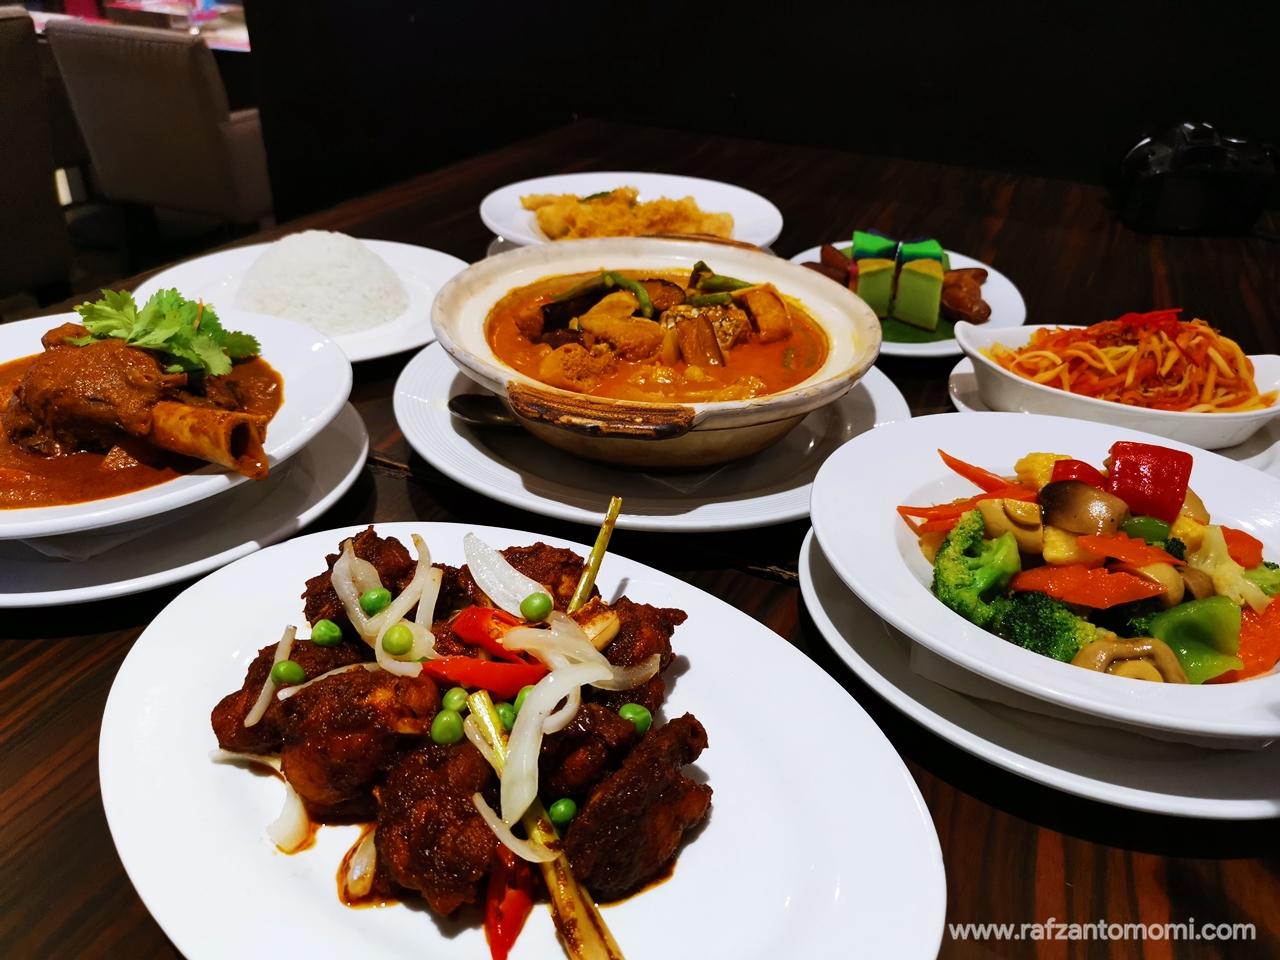 Set Menu Ramadan 2019 - Grandmama's Malaysia